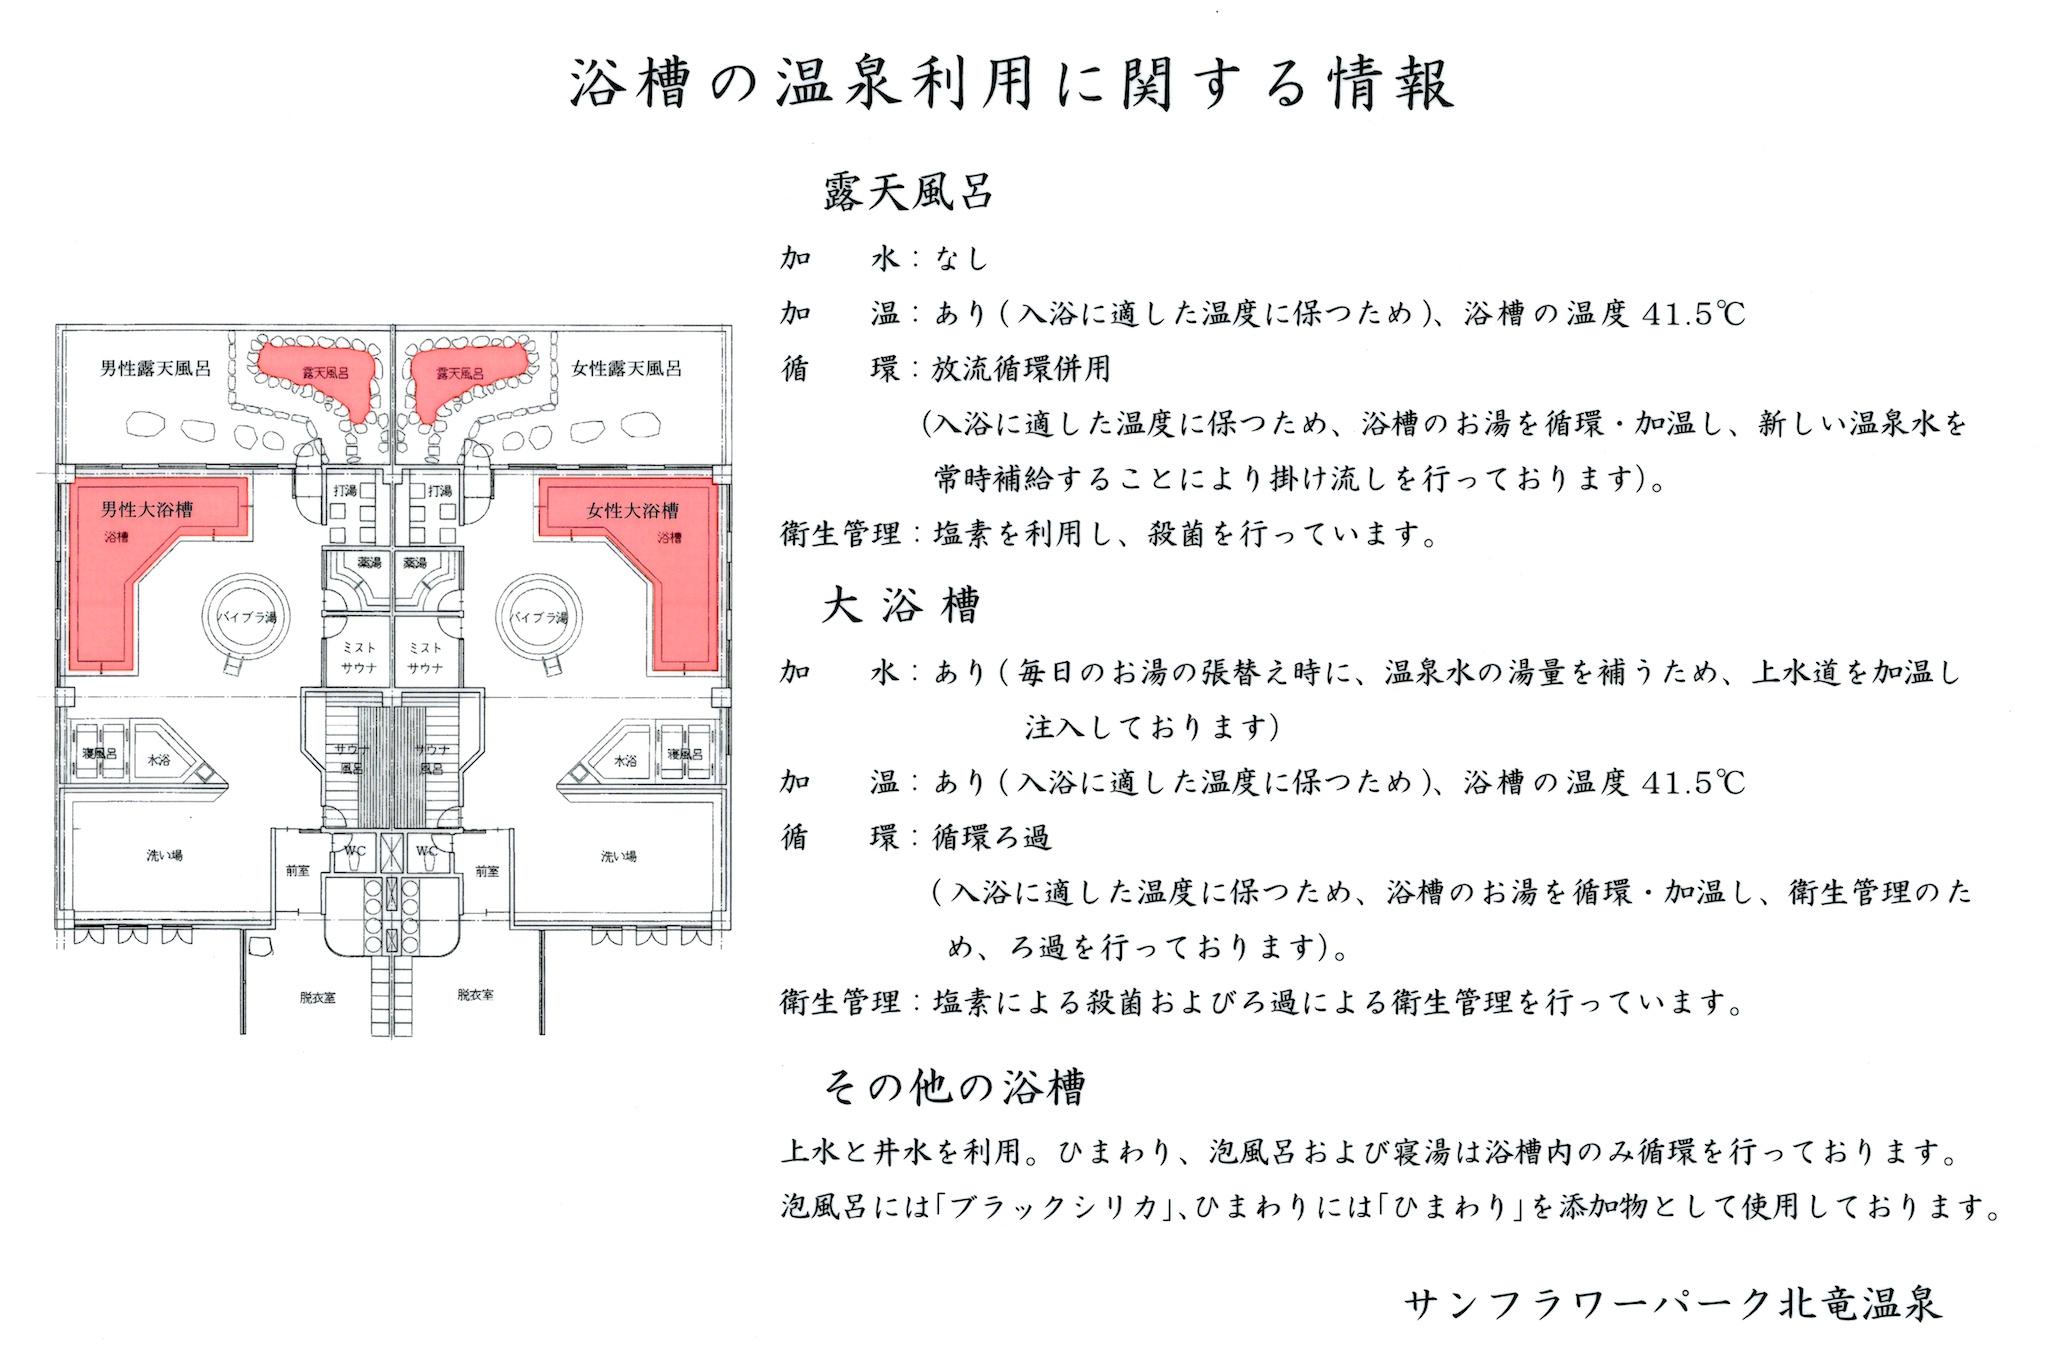 Photo: 浴槽の温泉利用に関する情報